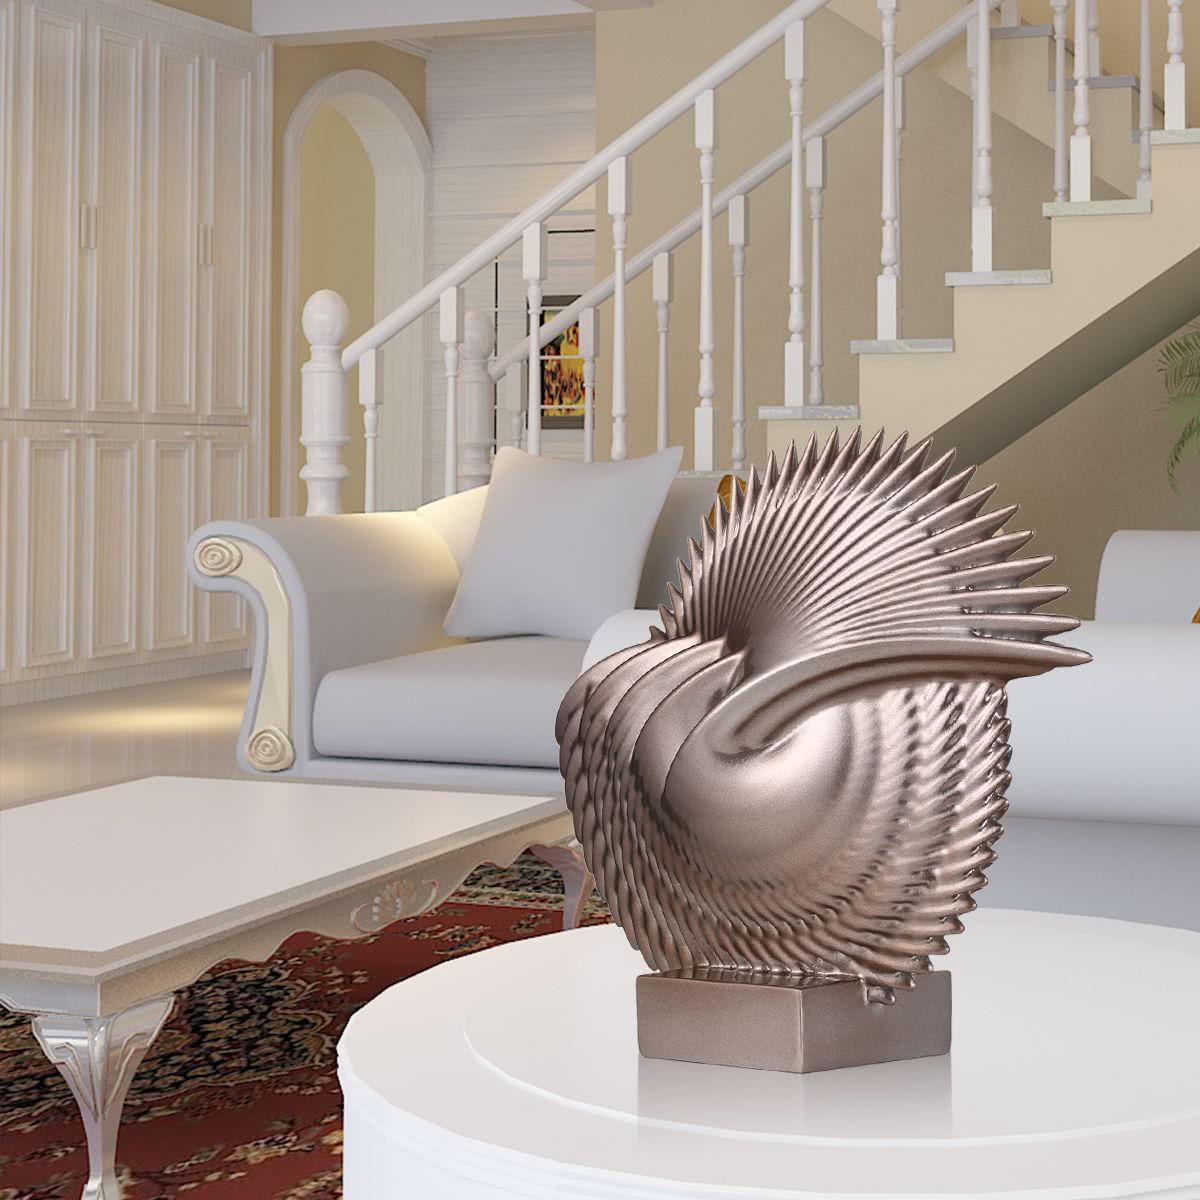 Hojas escultura de fibra de vidrio tomfeel la decoraci n - Esculturas decoracion ...